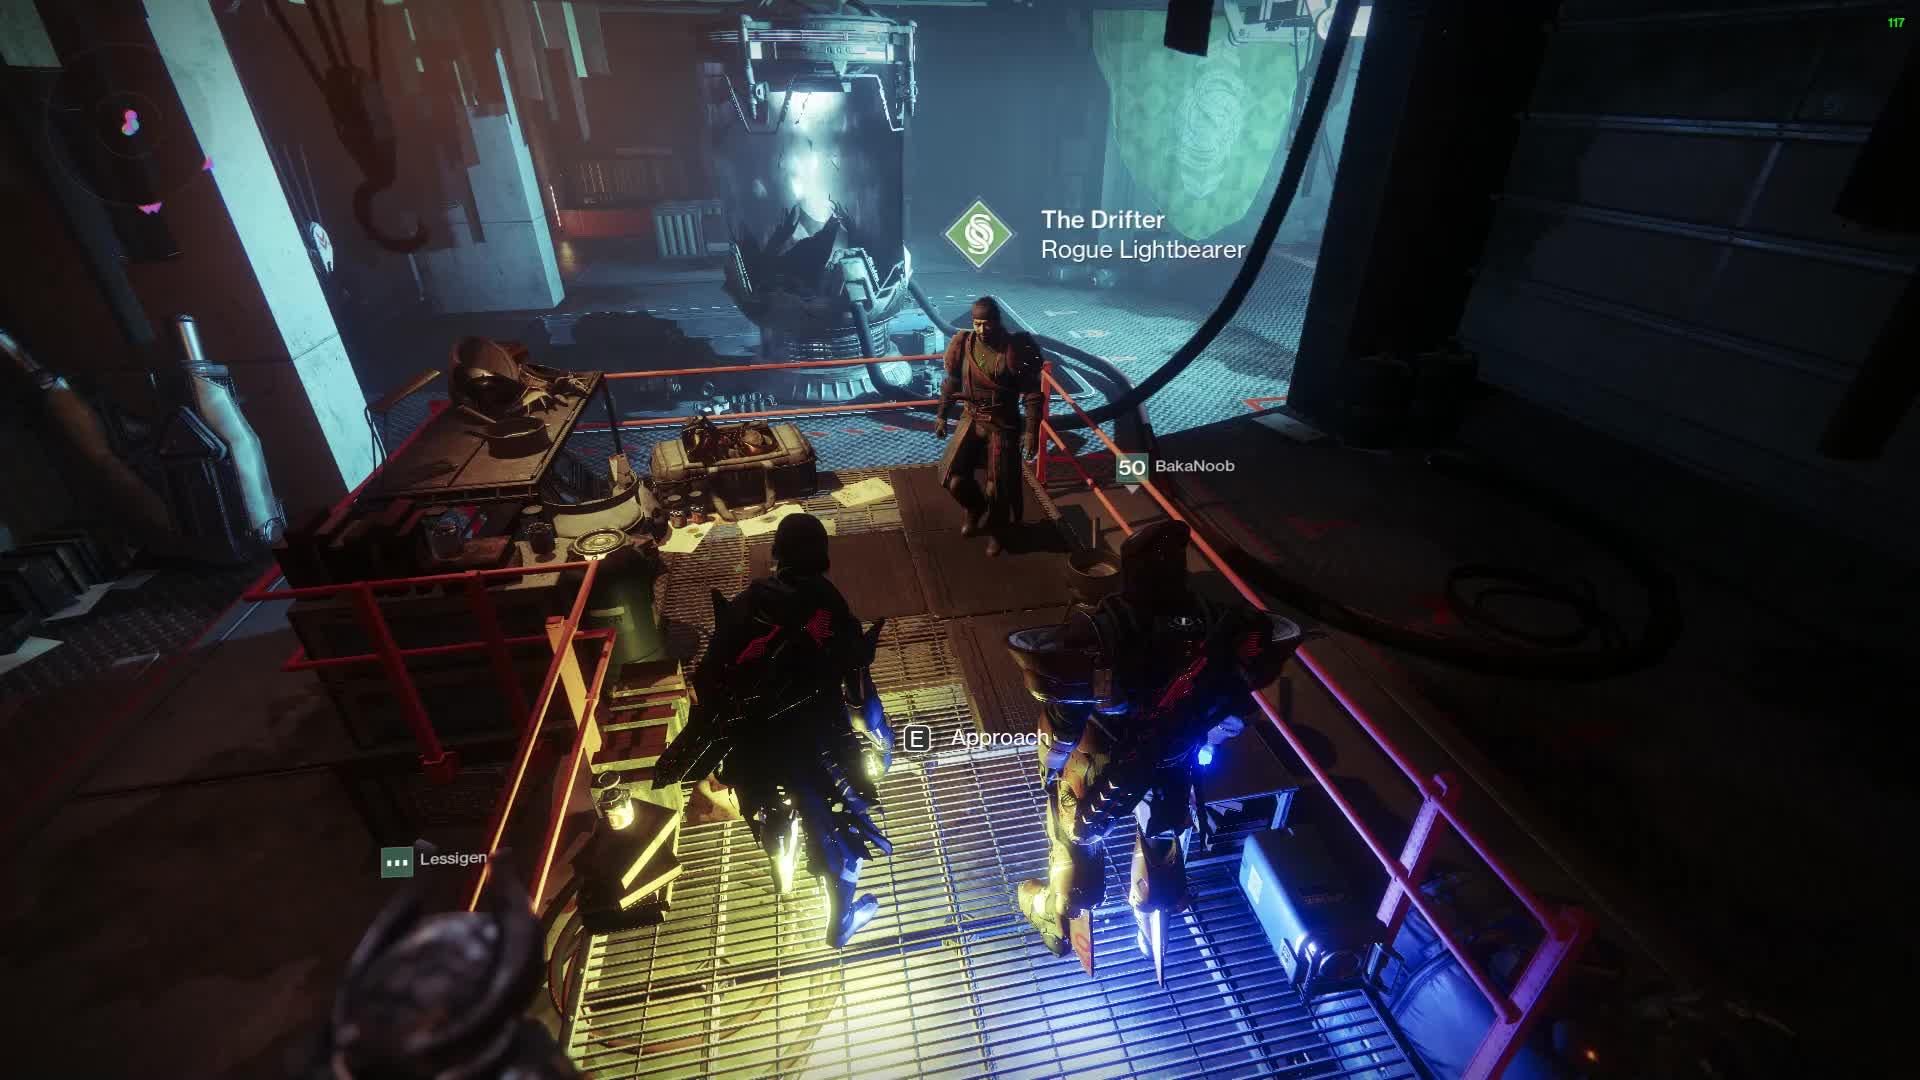 Destiny Destiny2 Gifs Search | Search & Share on Homdor